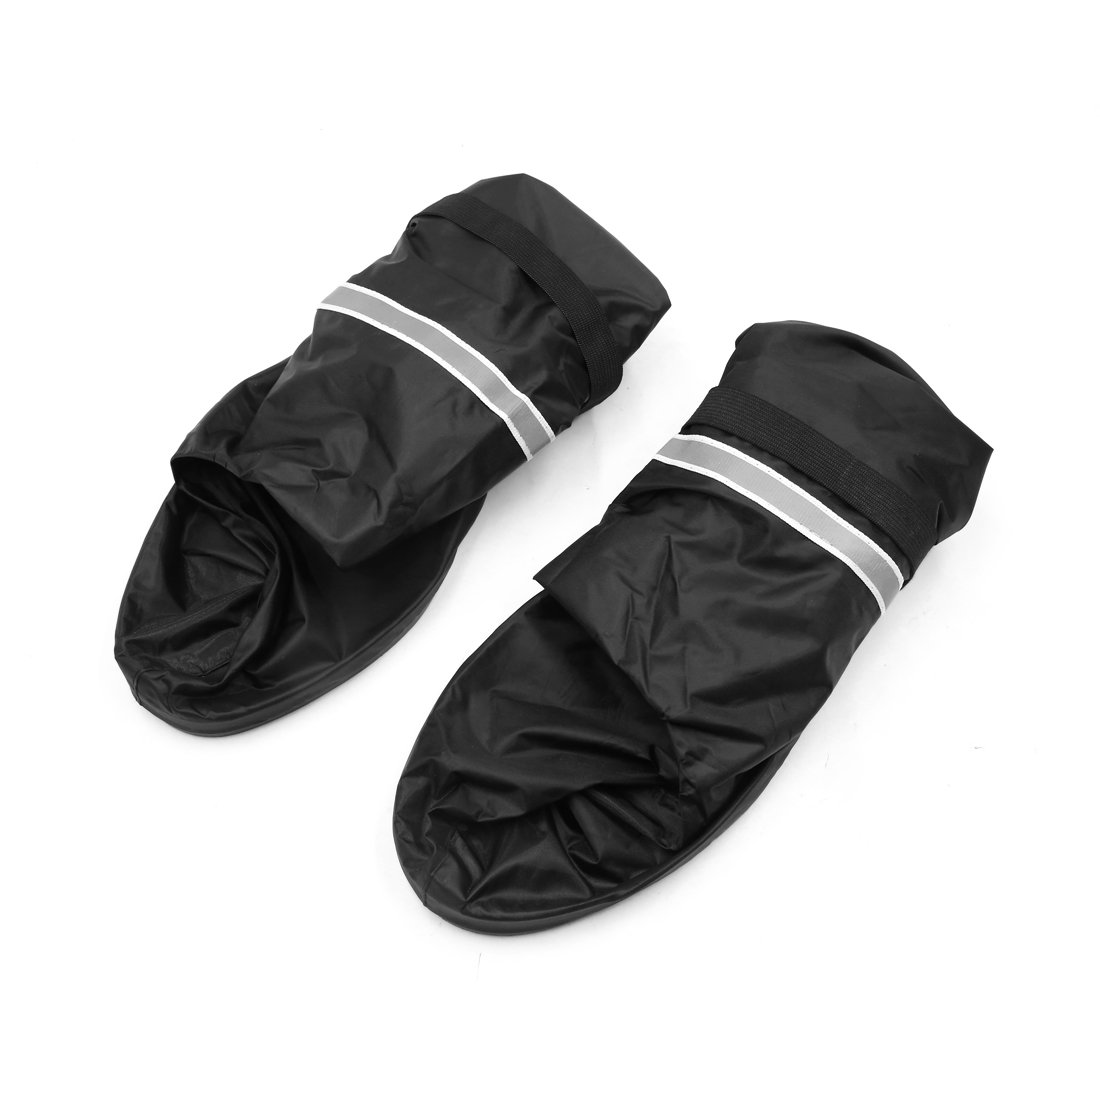 Sourcingmap Negro Impermeable Reflectante Botas de Lluvia para Moto Hombre 44 45